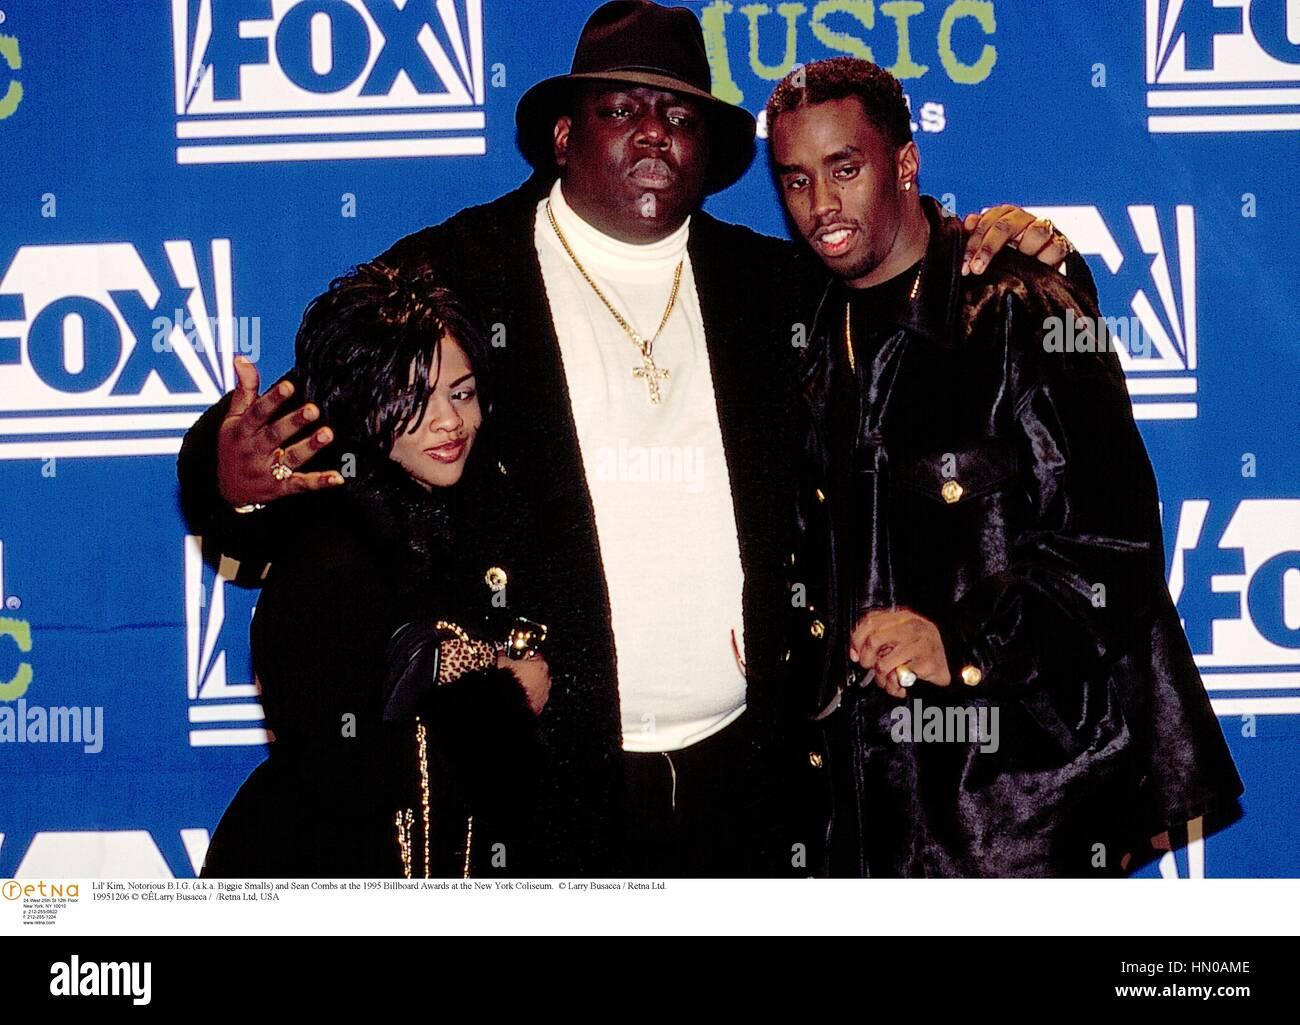 fa520c109 Lil' Kim, Notorious B.I.G. (a.k.a. Biggie Smalls) and Sean Combs at the